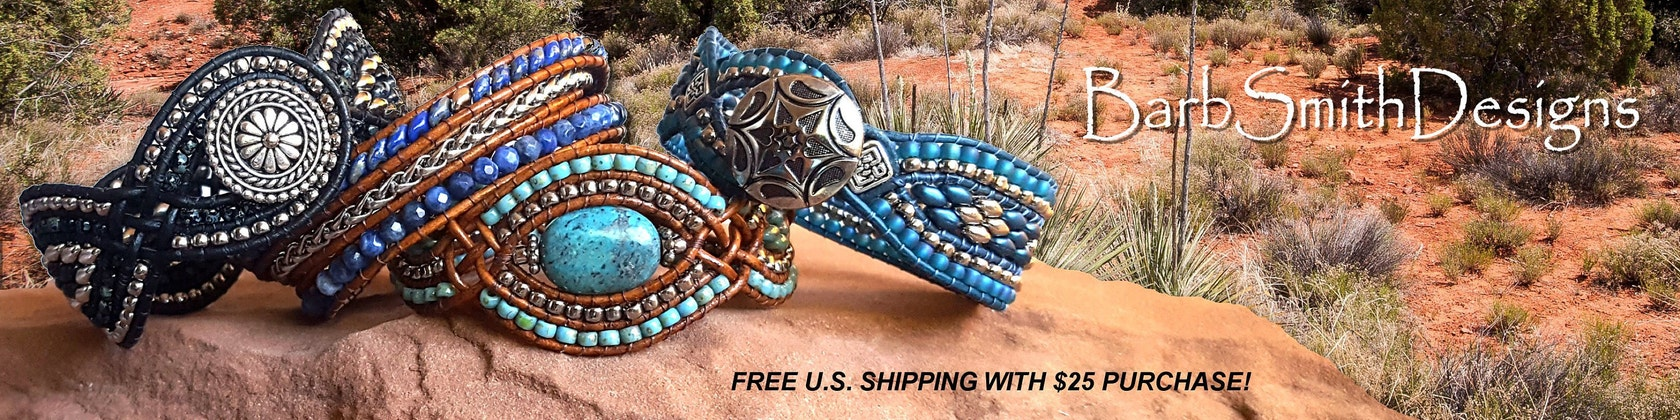 Beaded Leather Bracelets in Custom Sizes por BarbSmithDesigns